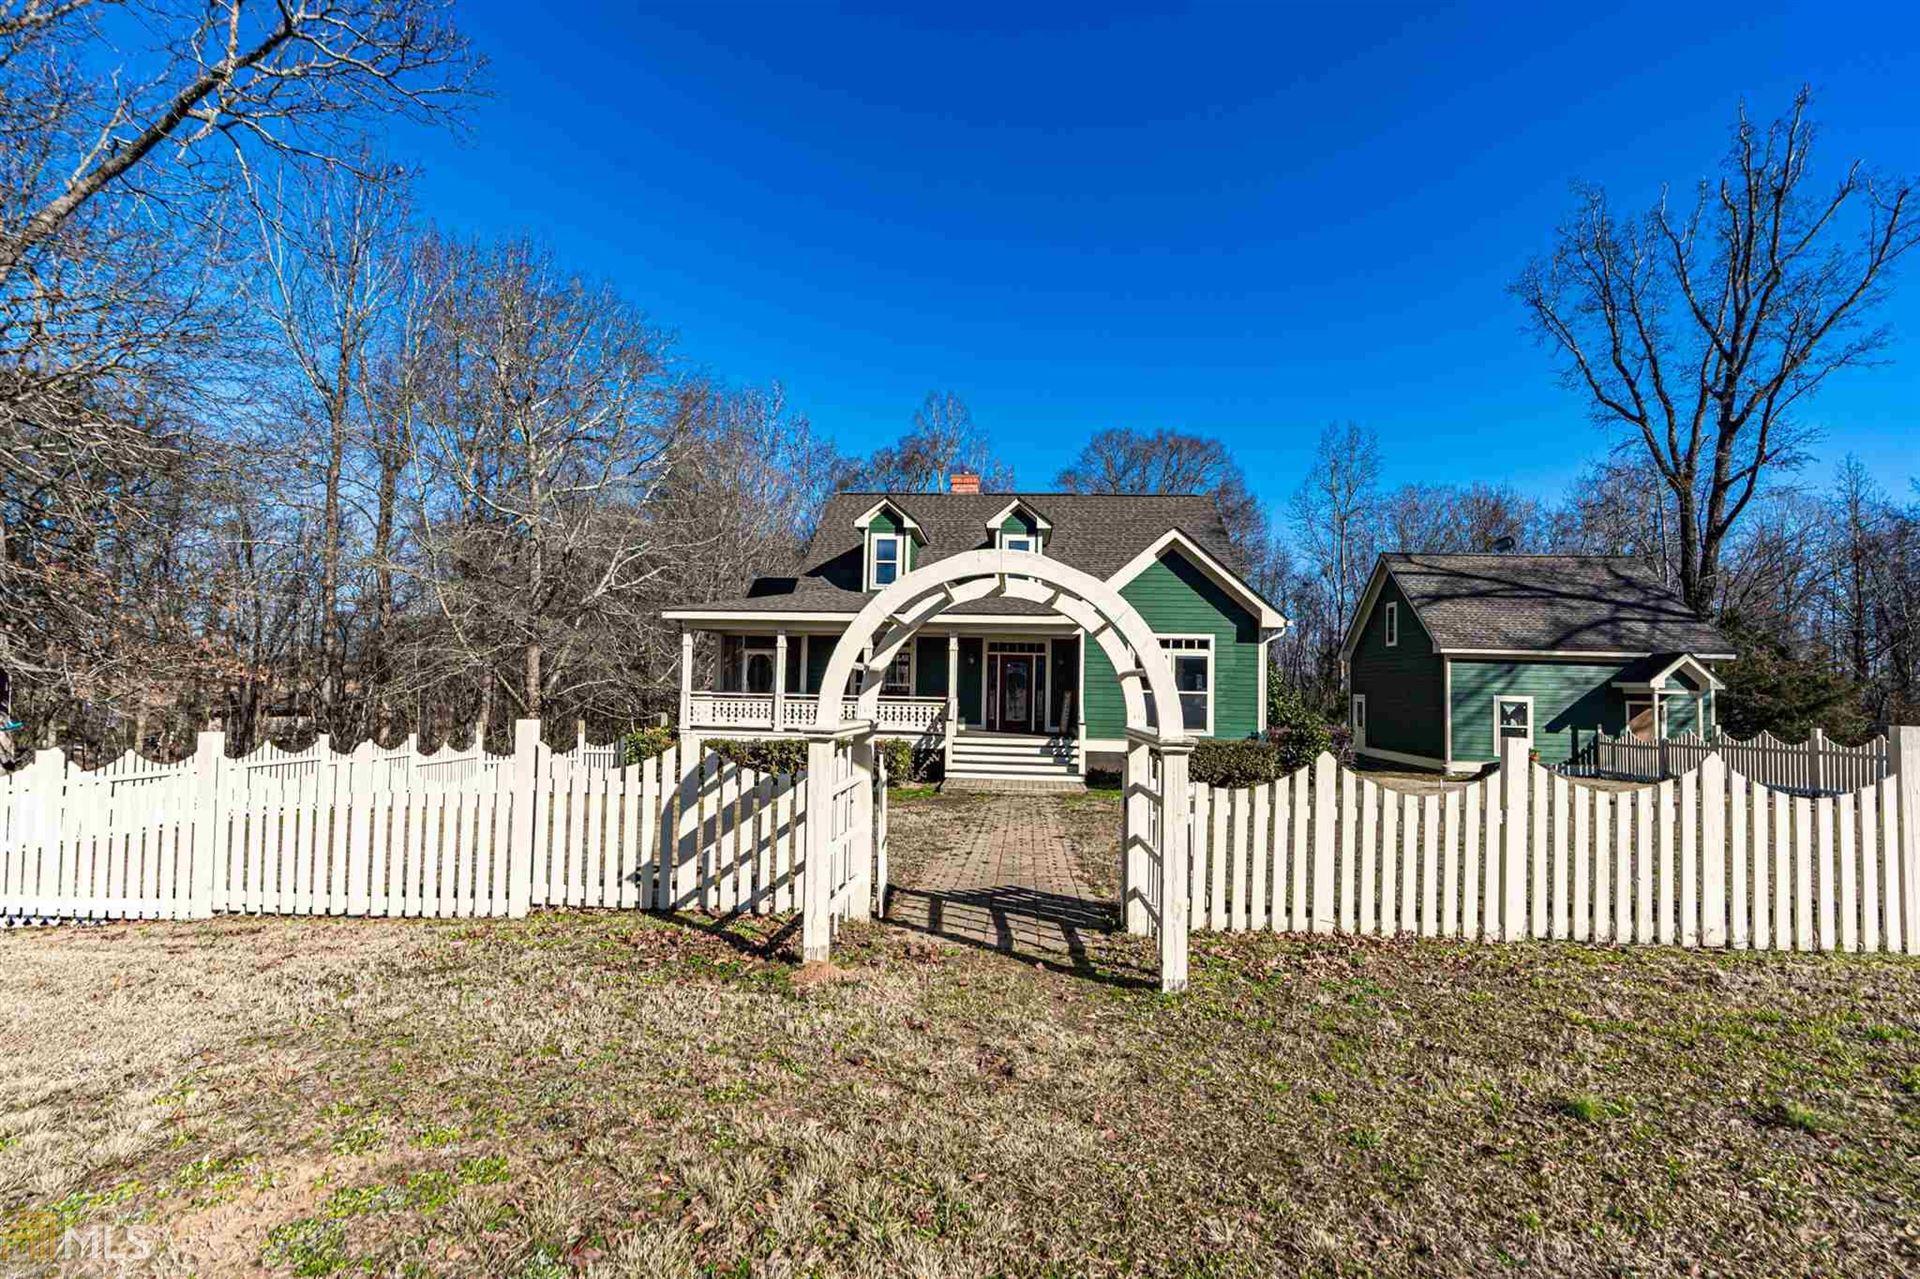 Photo of 1020 Cedar Grove Rd, Buckhead, GA 30625 (MLS # 8916878)